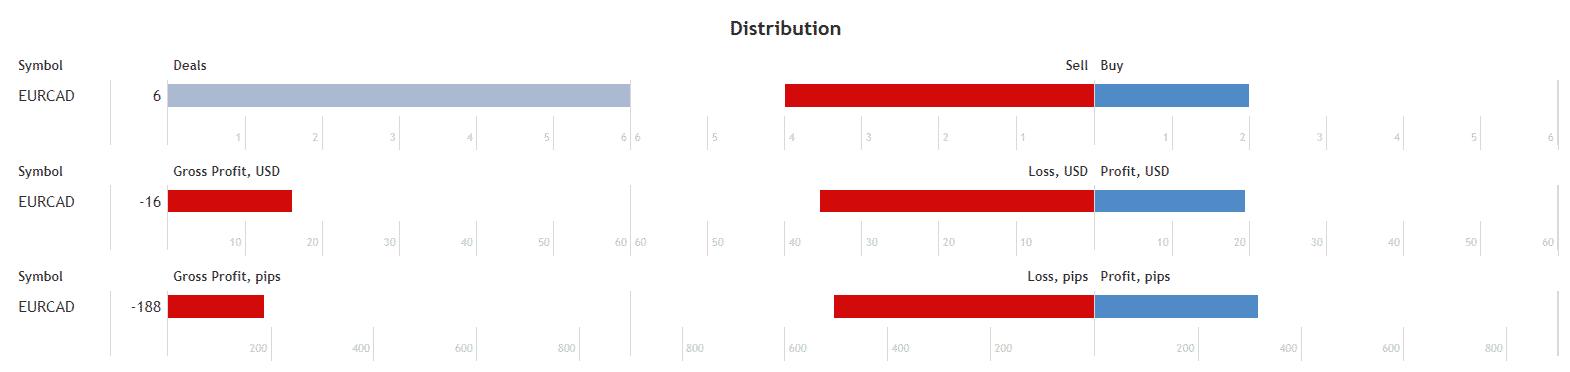 Top Scalper distribution details